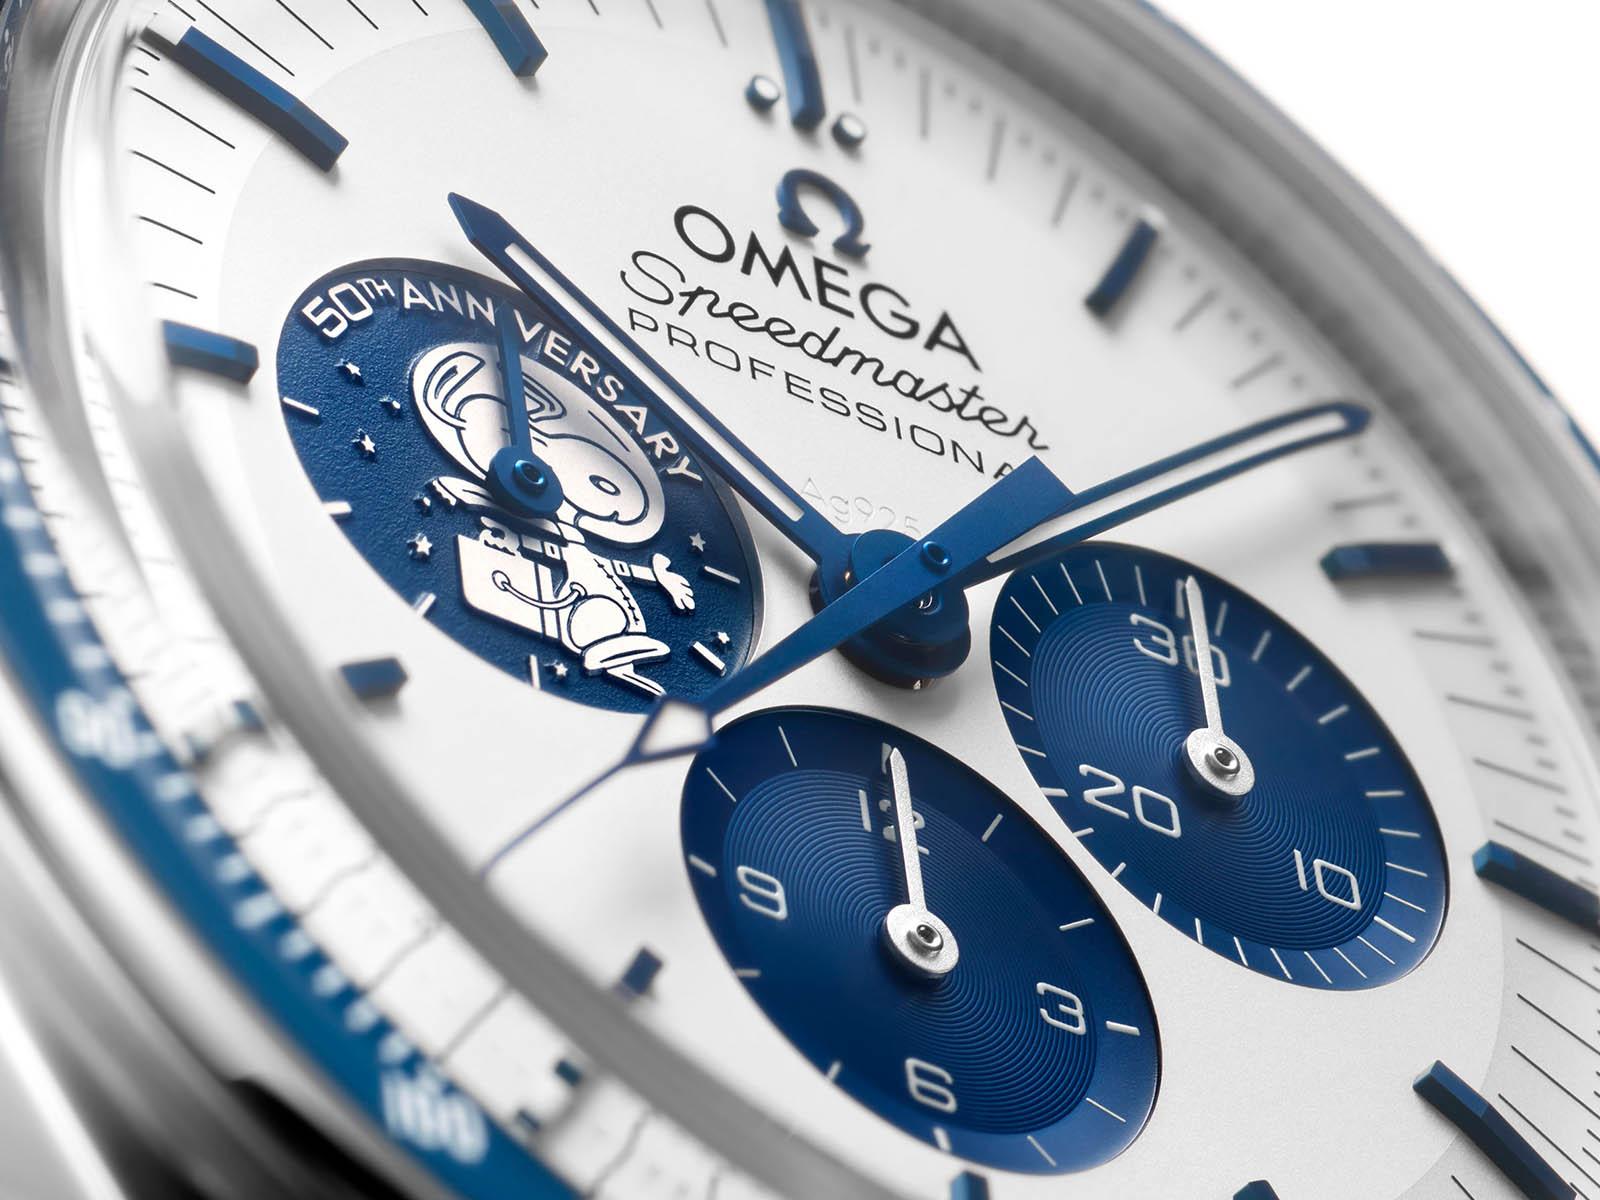 310-32-42-50-02-001-omega-speedmaster-silver-snoopy-award-50th-anniversary-3.jpg